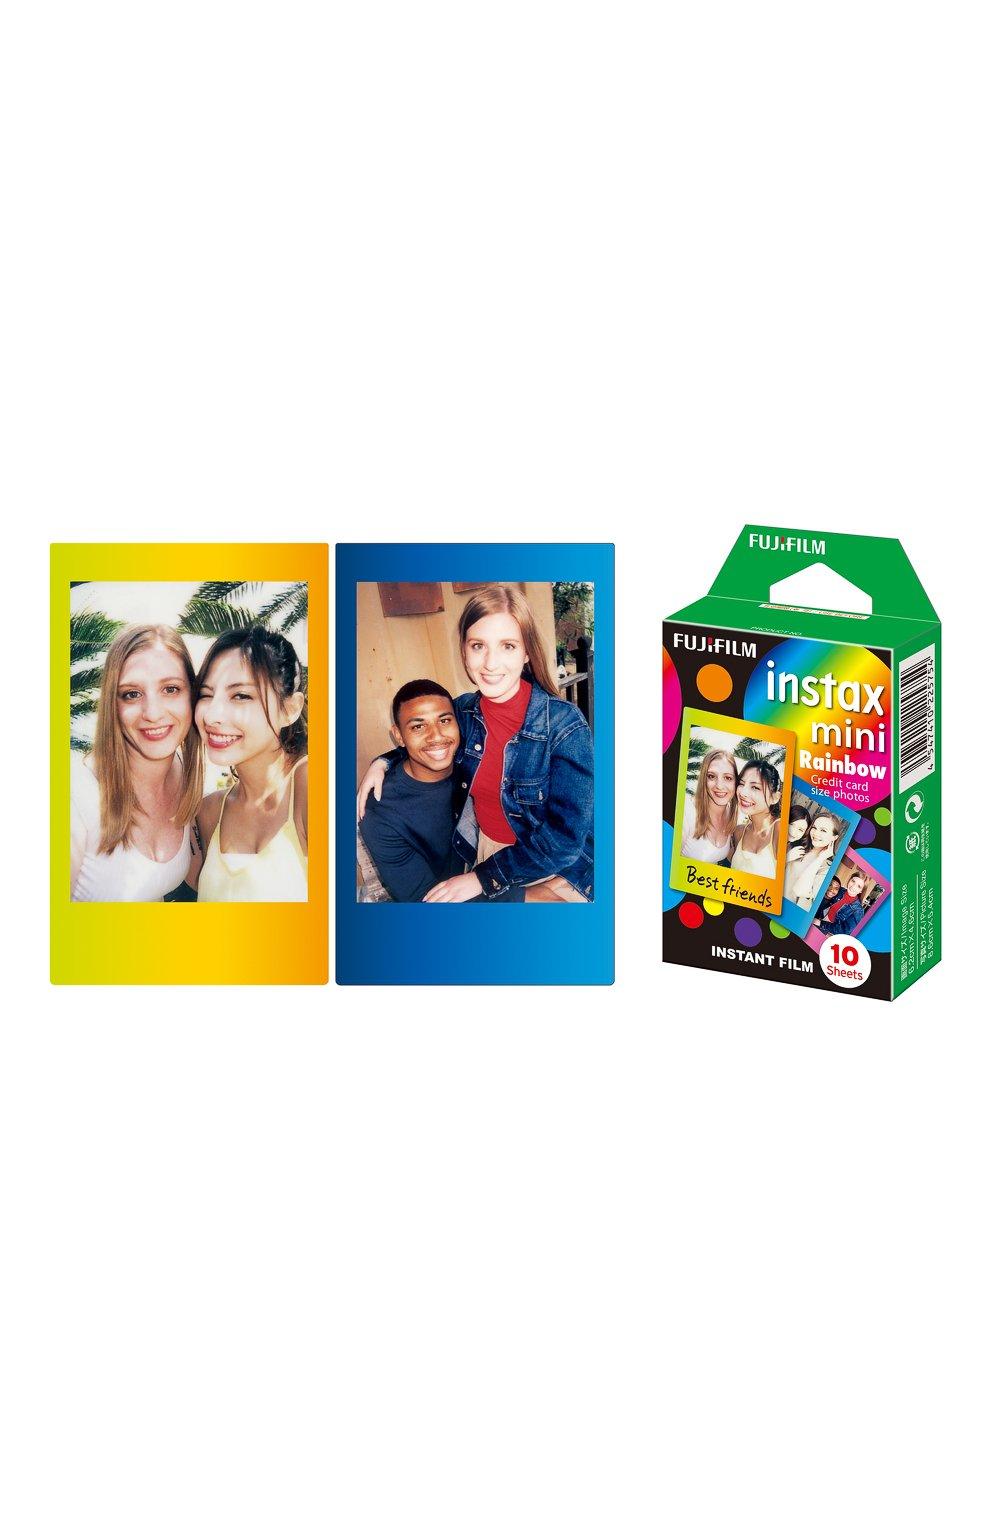 Фотопленка fujifilm instax mini rainbow INSTAX разноцветного цвета, арт. 4547410225754 | Фото 2